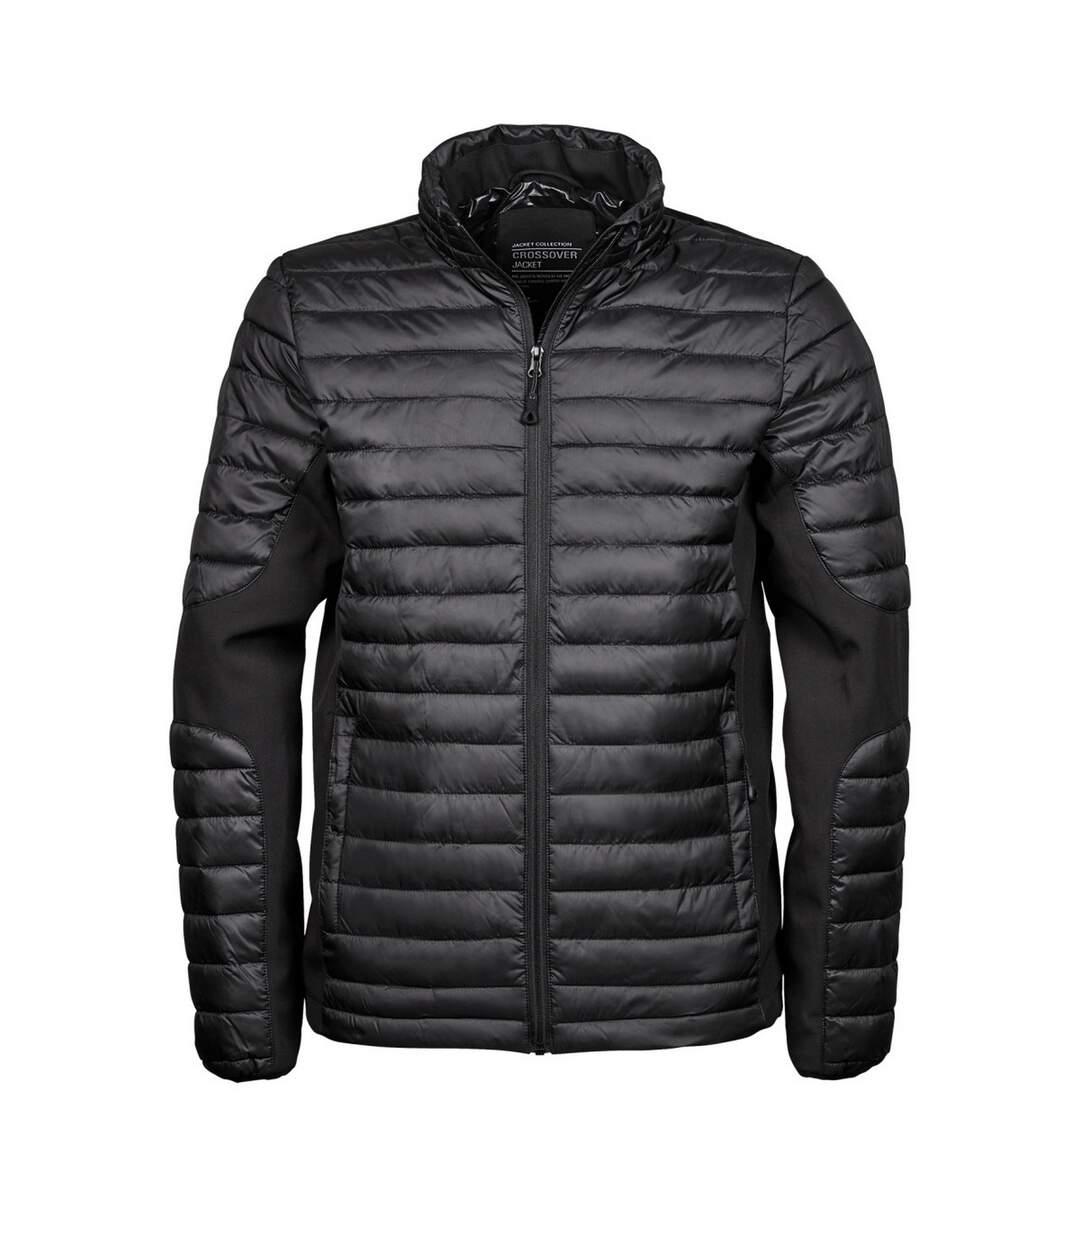 Teejays Mens Padded Full Zip Crossover Jacket (Black/Black) - UTBC3834